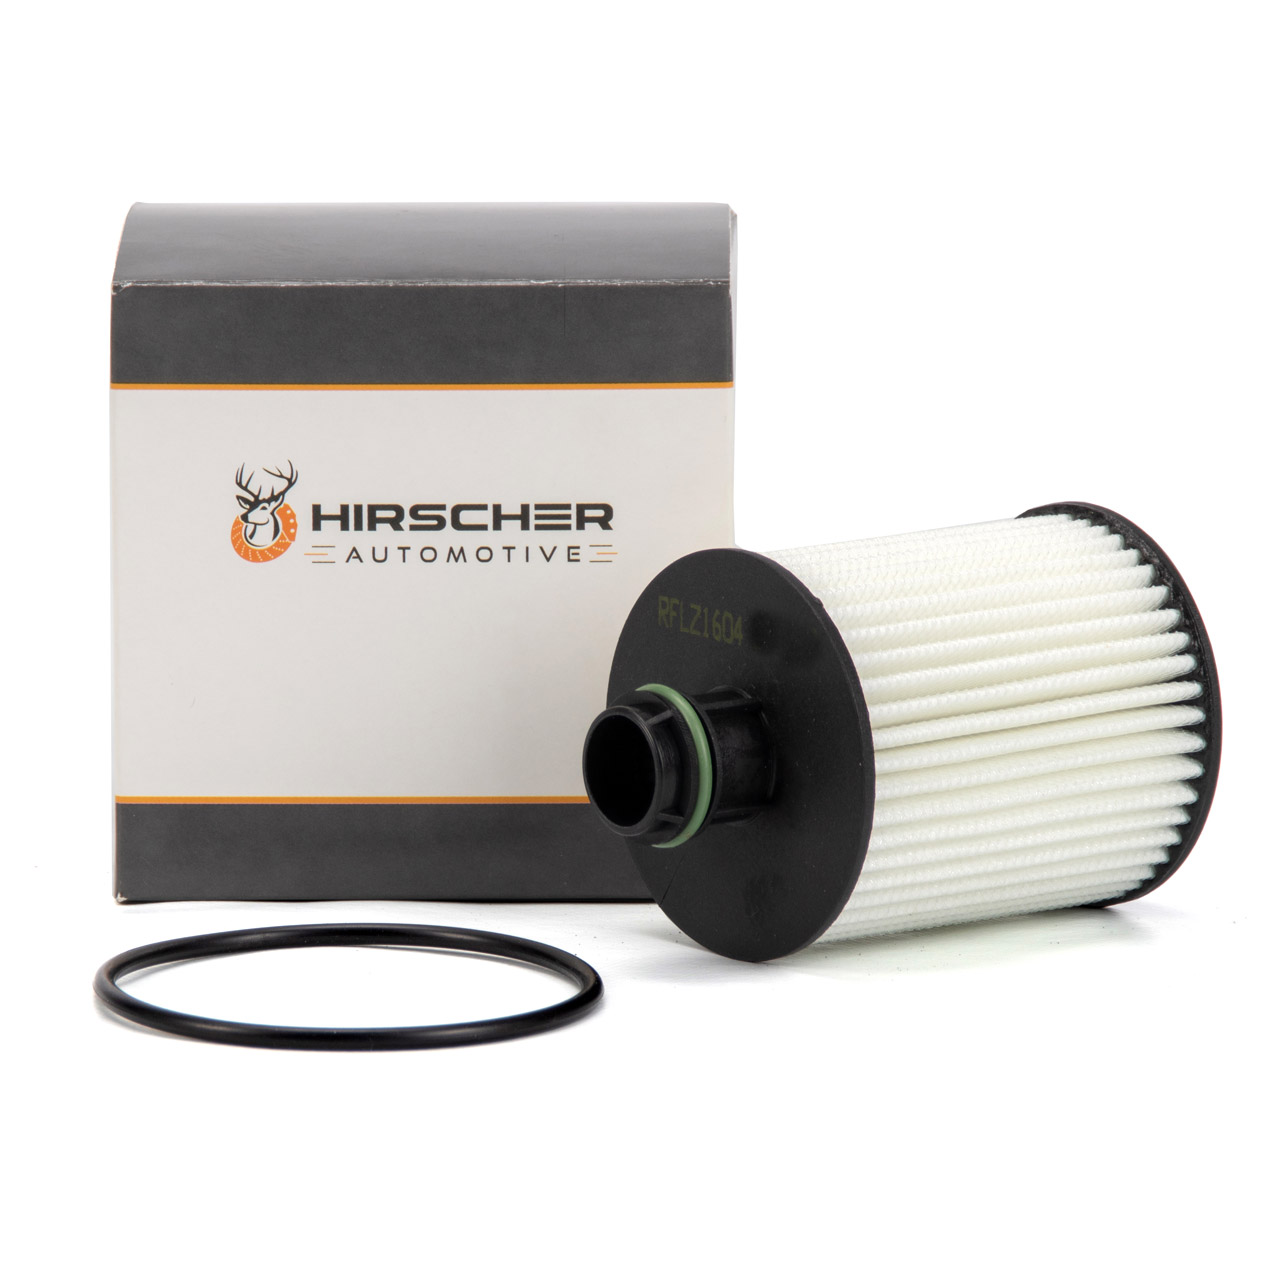 HIRSCHER Ölfilter OPEL Astra Cascada Corsa Insignia Meriva Zafira 2.0 CDTI 95528278